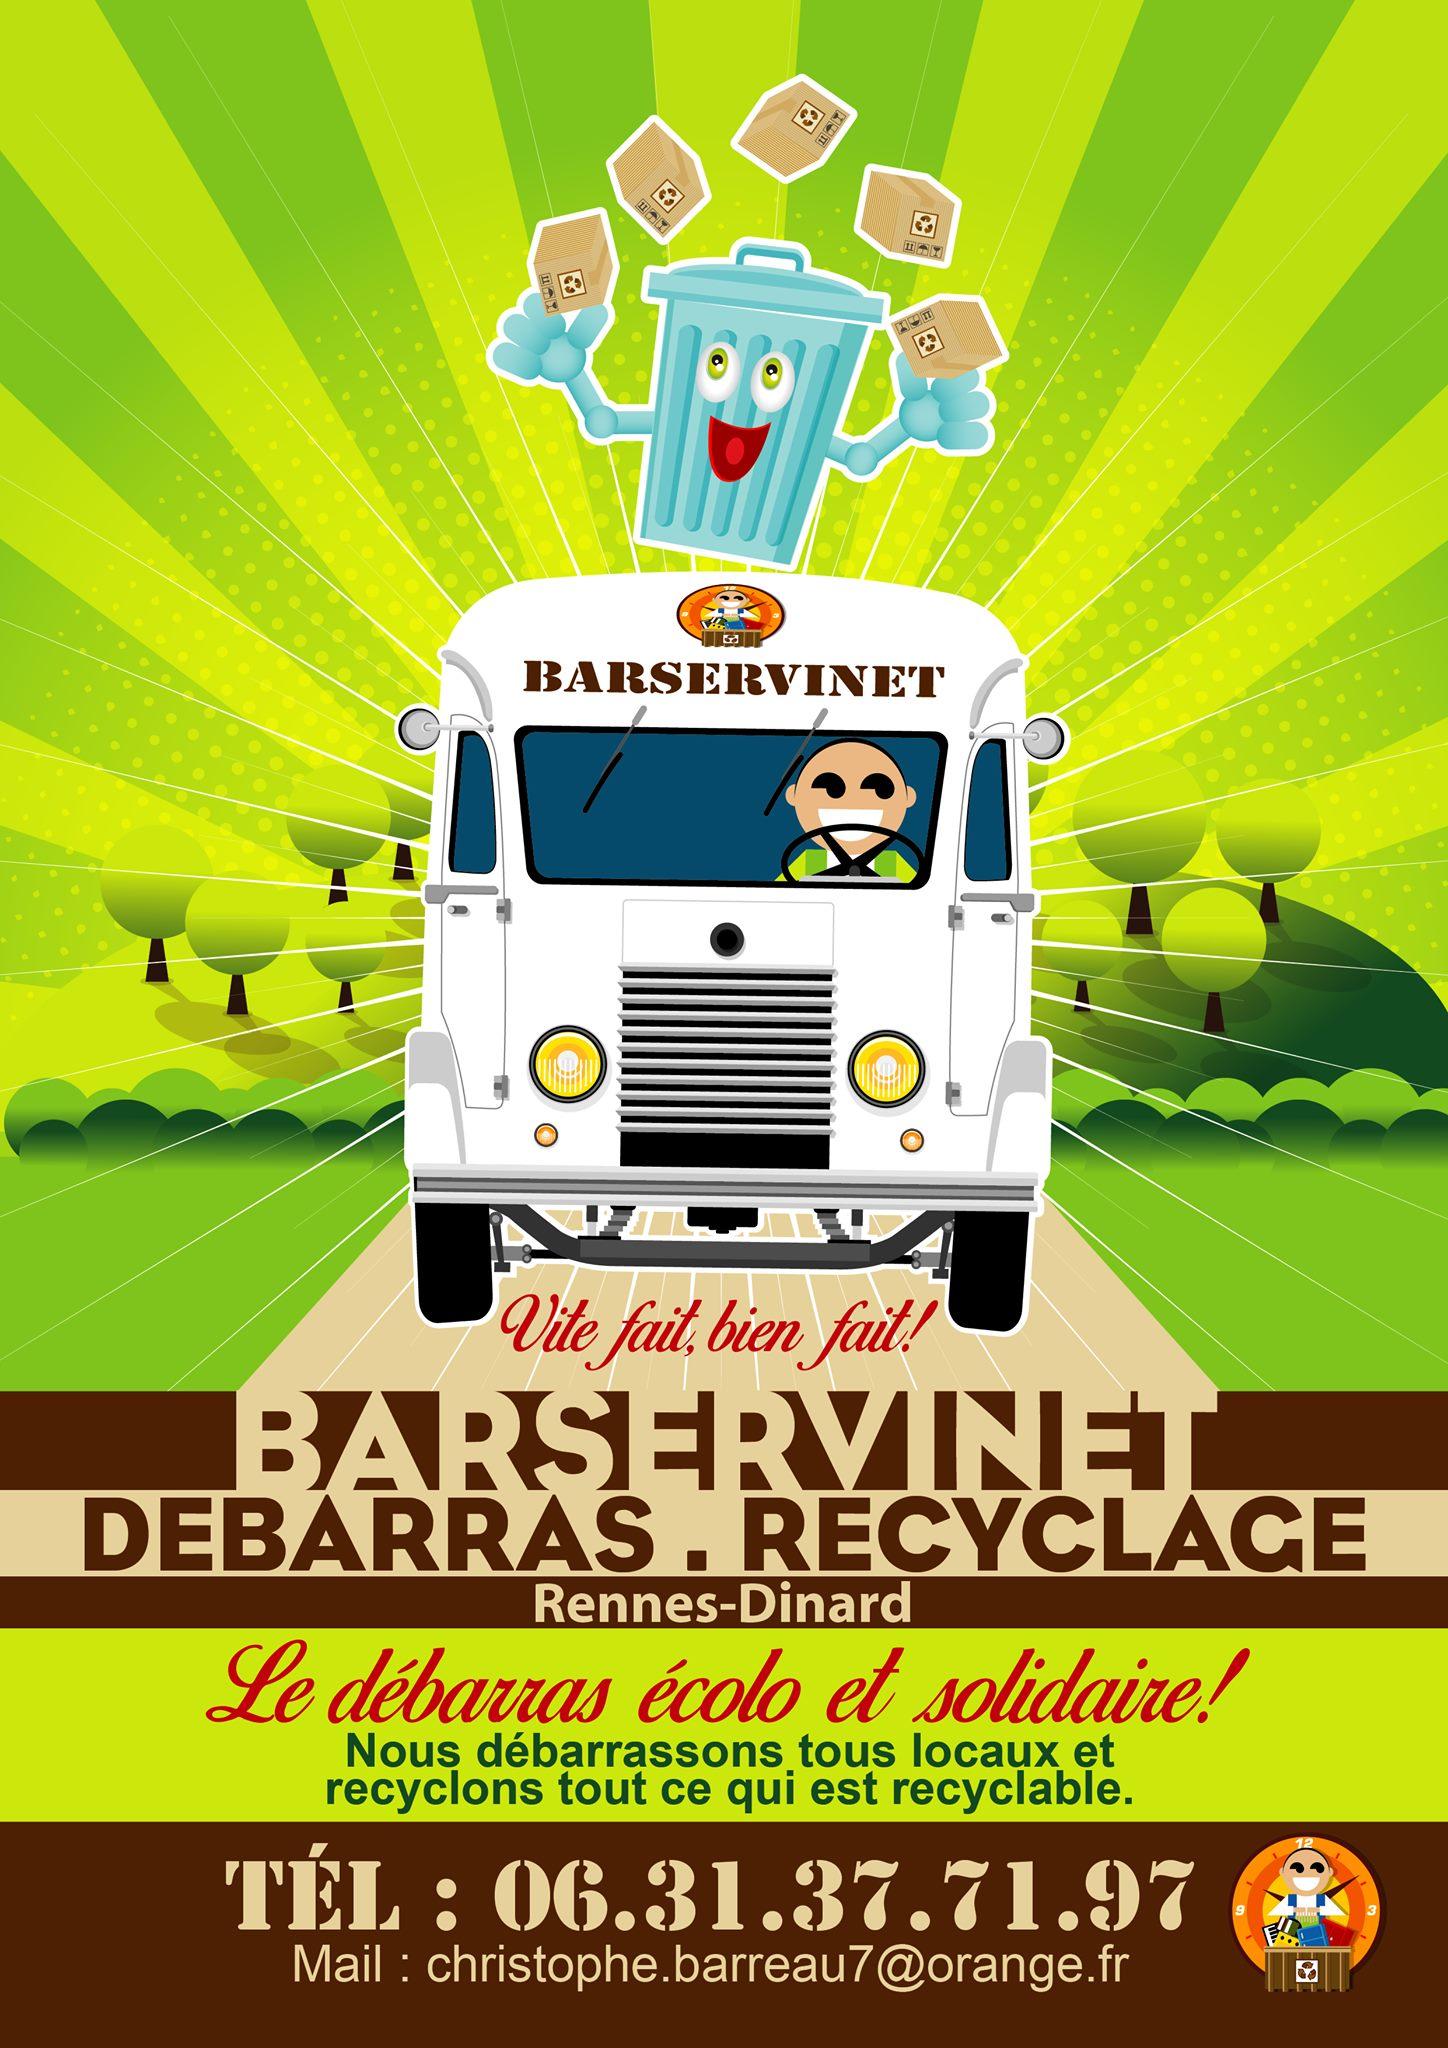 BARSERVINET